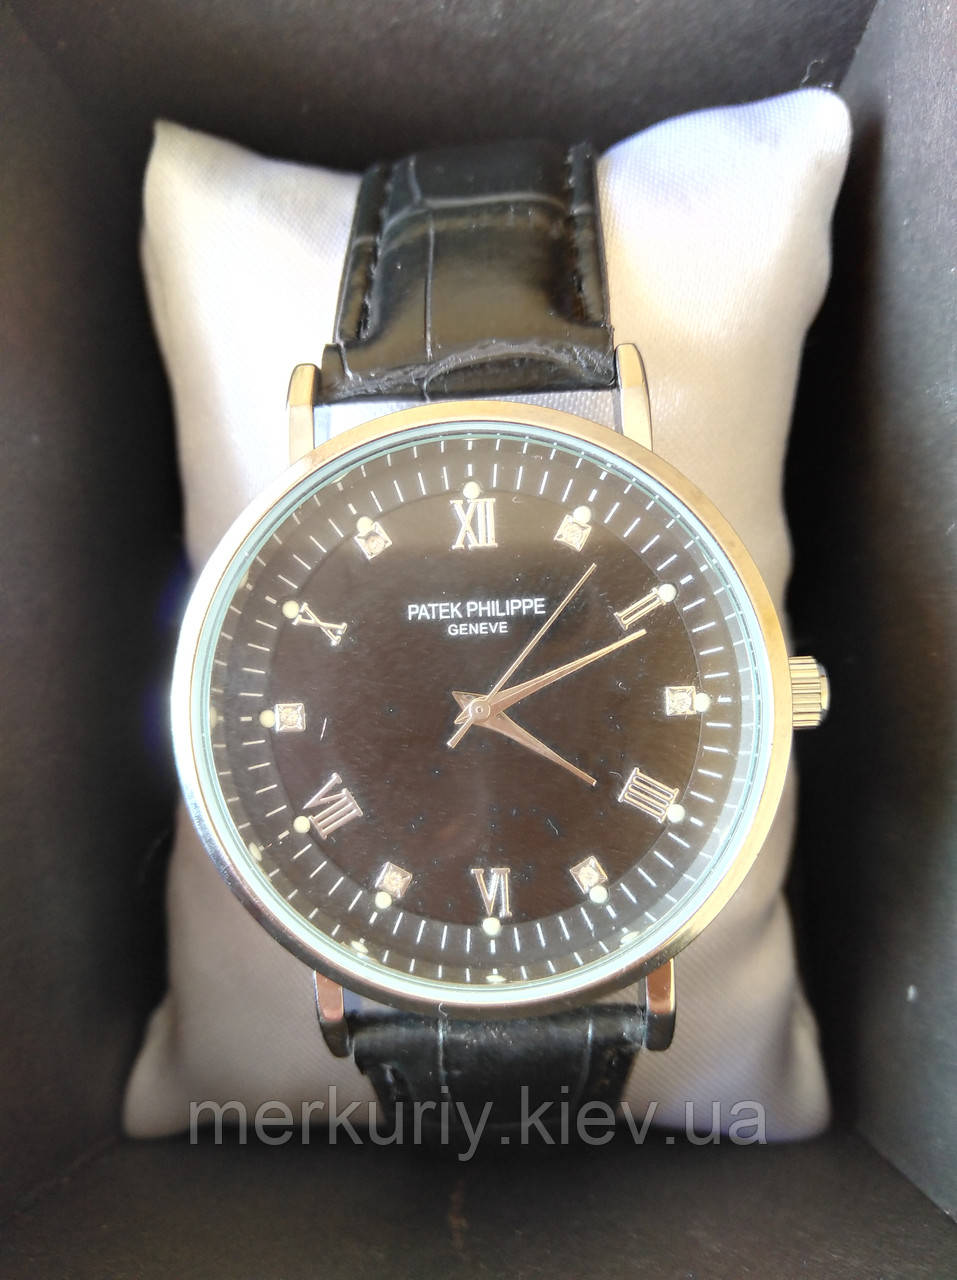 Кварцевые мужские часы Patek Philippe Geneve (Патек Филипп ... 155491b6c92